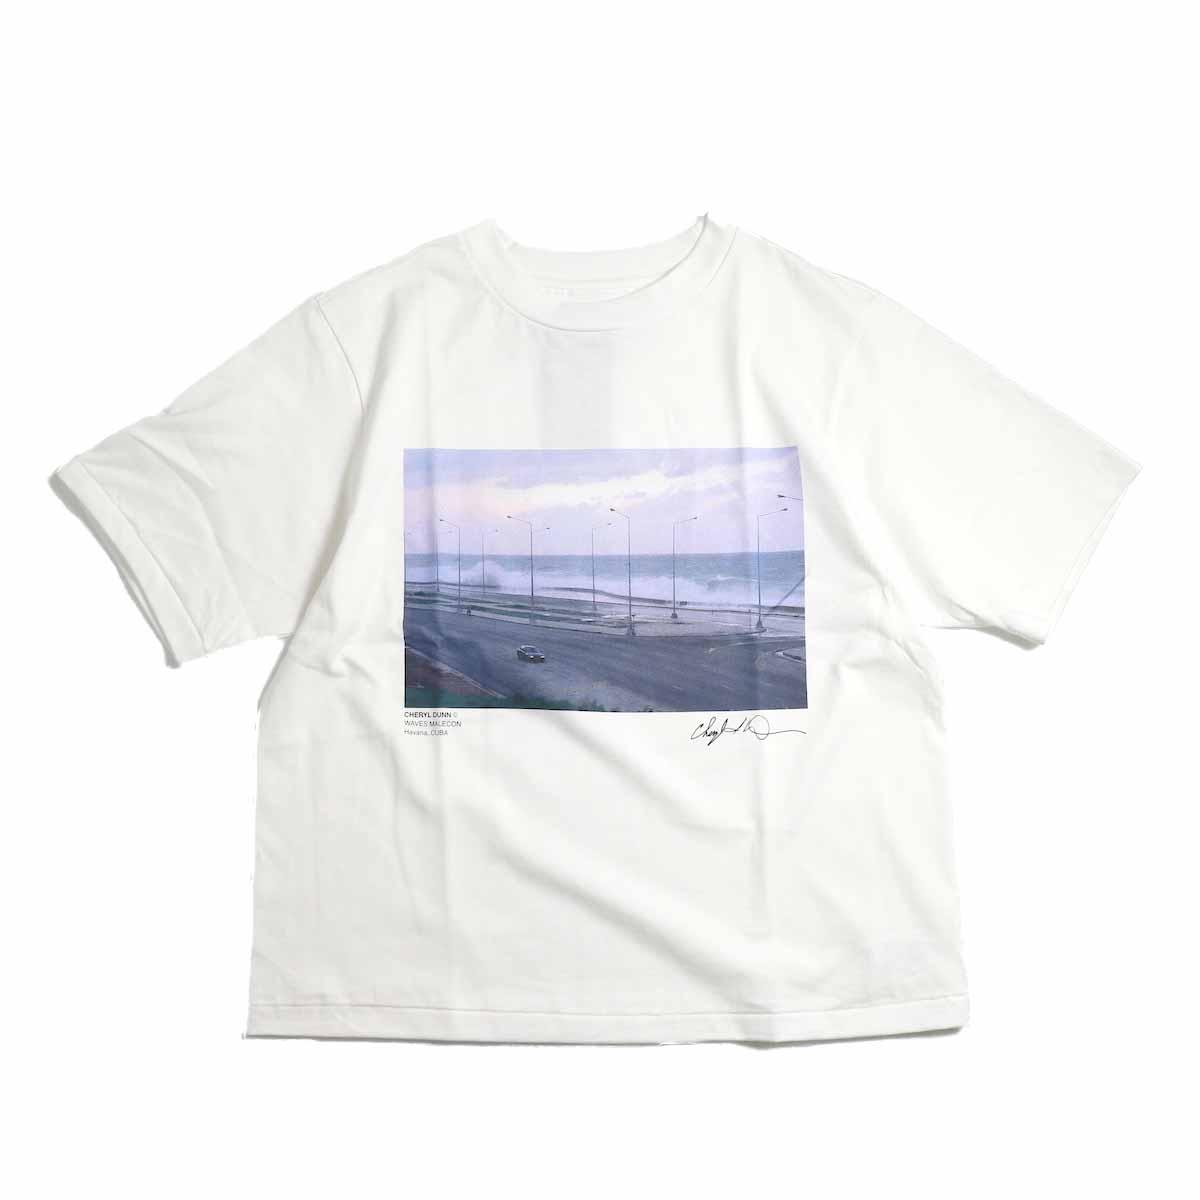 JANE SMITH / Cheryl Dunn Waves Malecon Short Sleeve T-Shirt -White